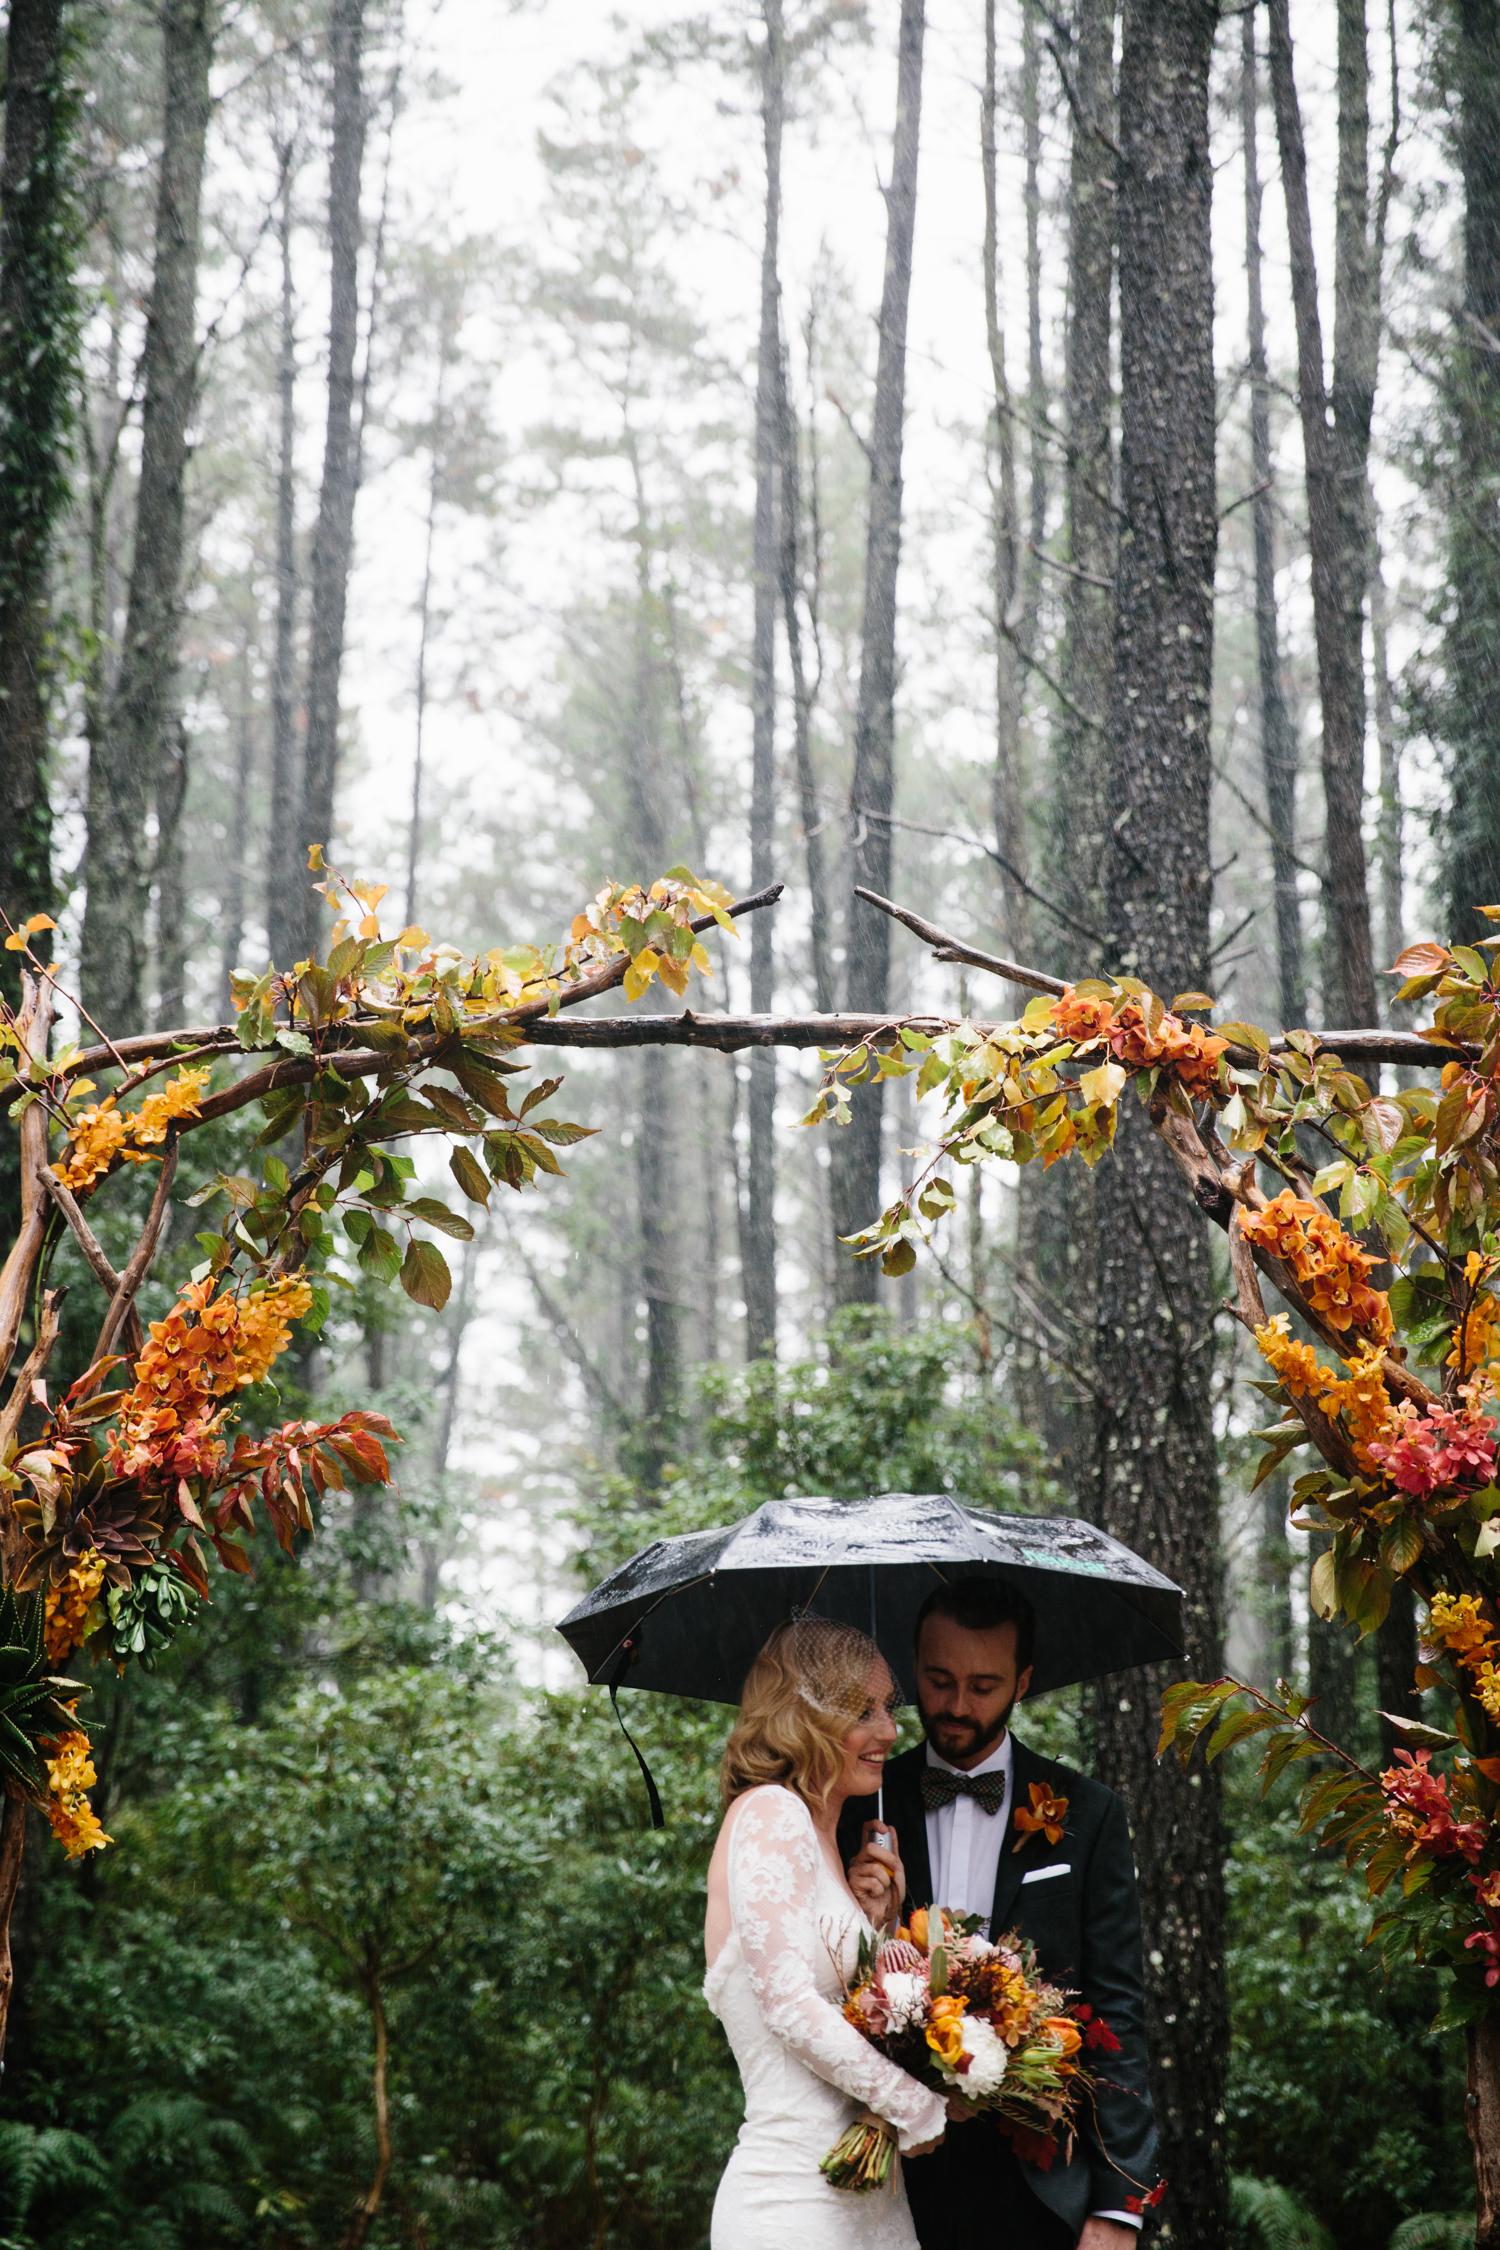 Lindsay-Nick-bilpin-pine-forrest-nsw-wedding-101